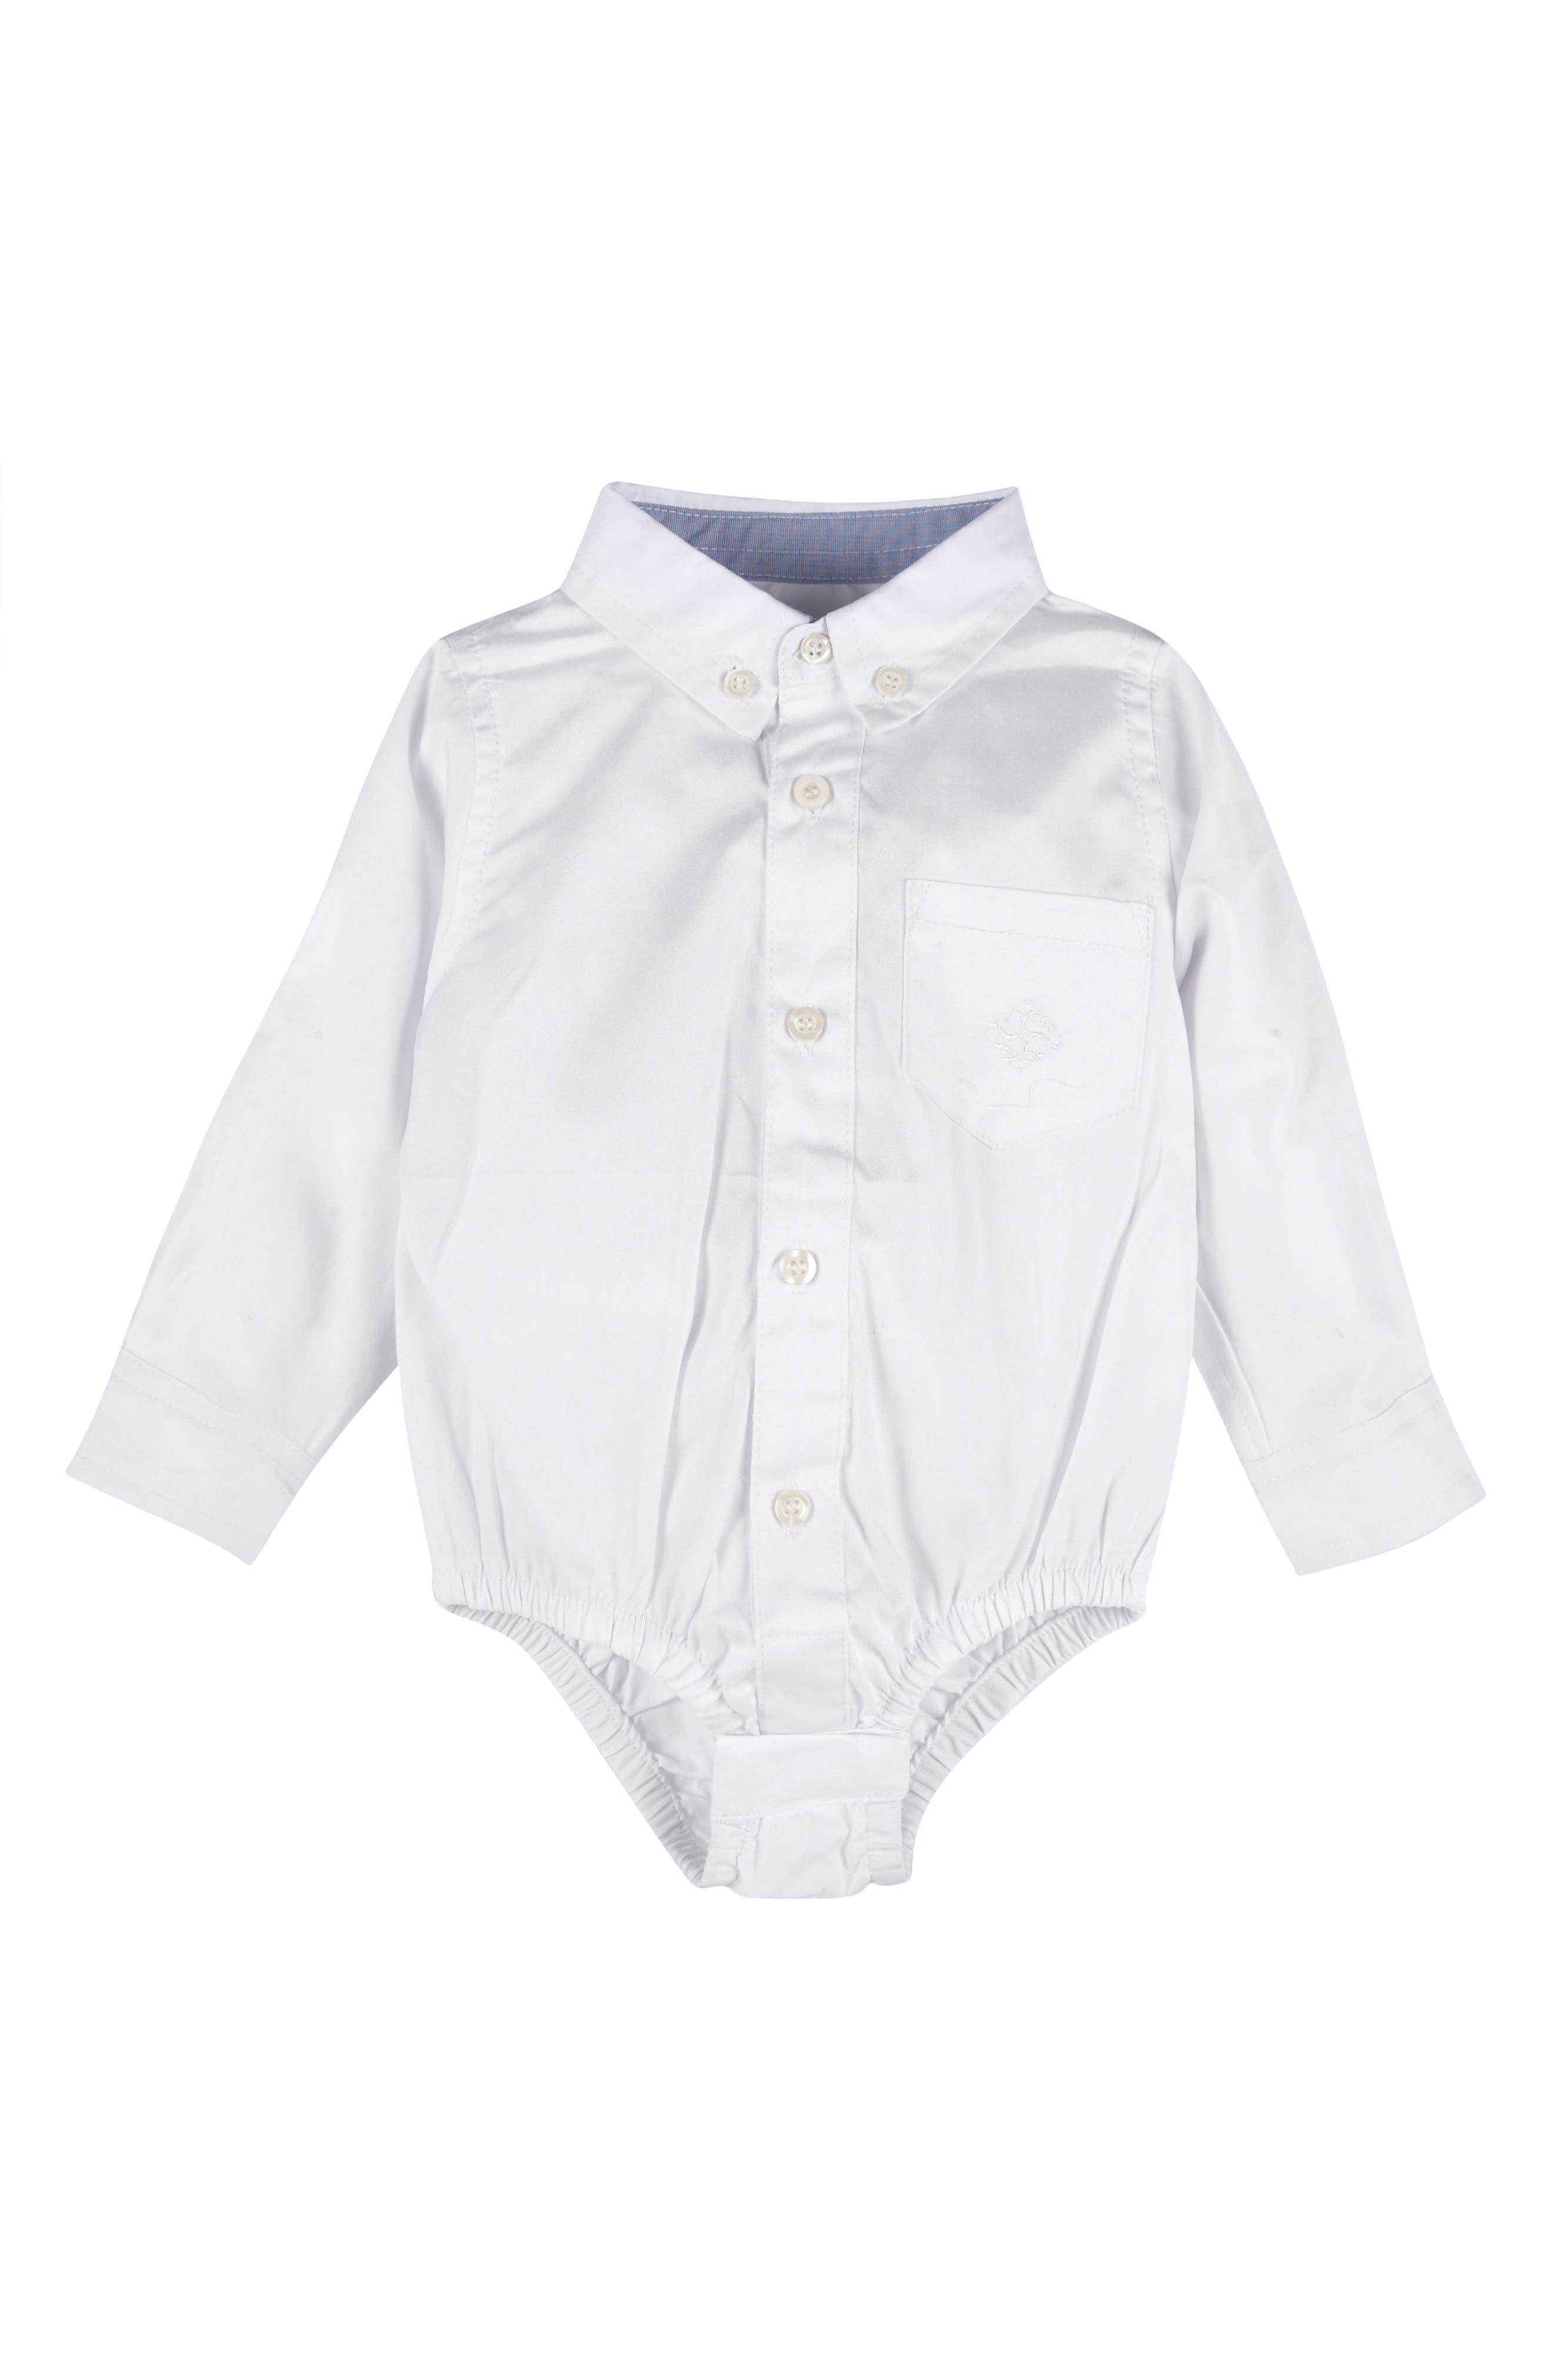 Andy & Evan Oxford Bodysuit (Baby Boys)